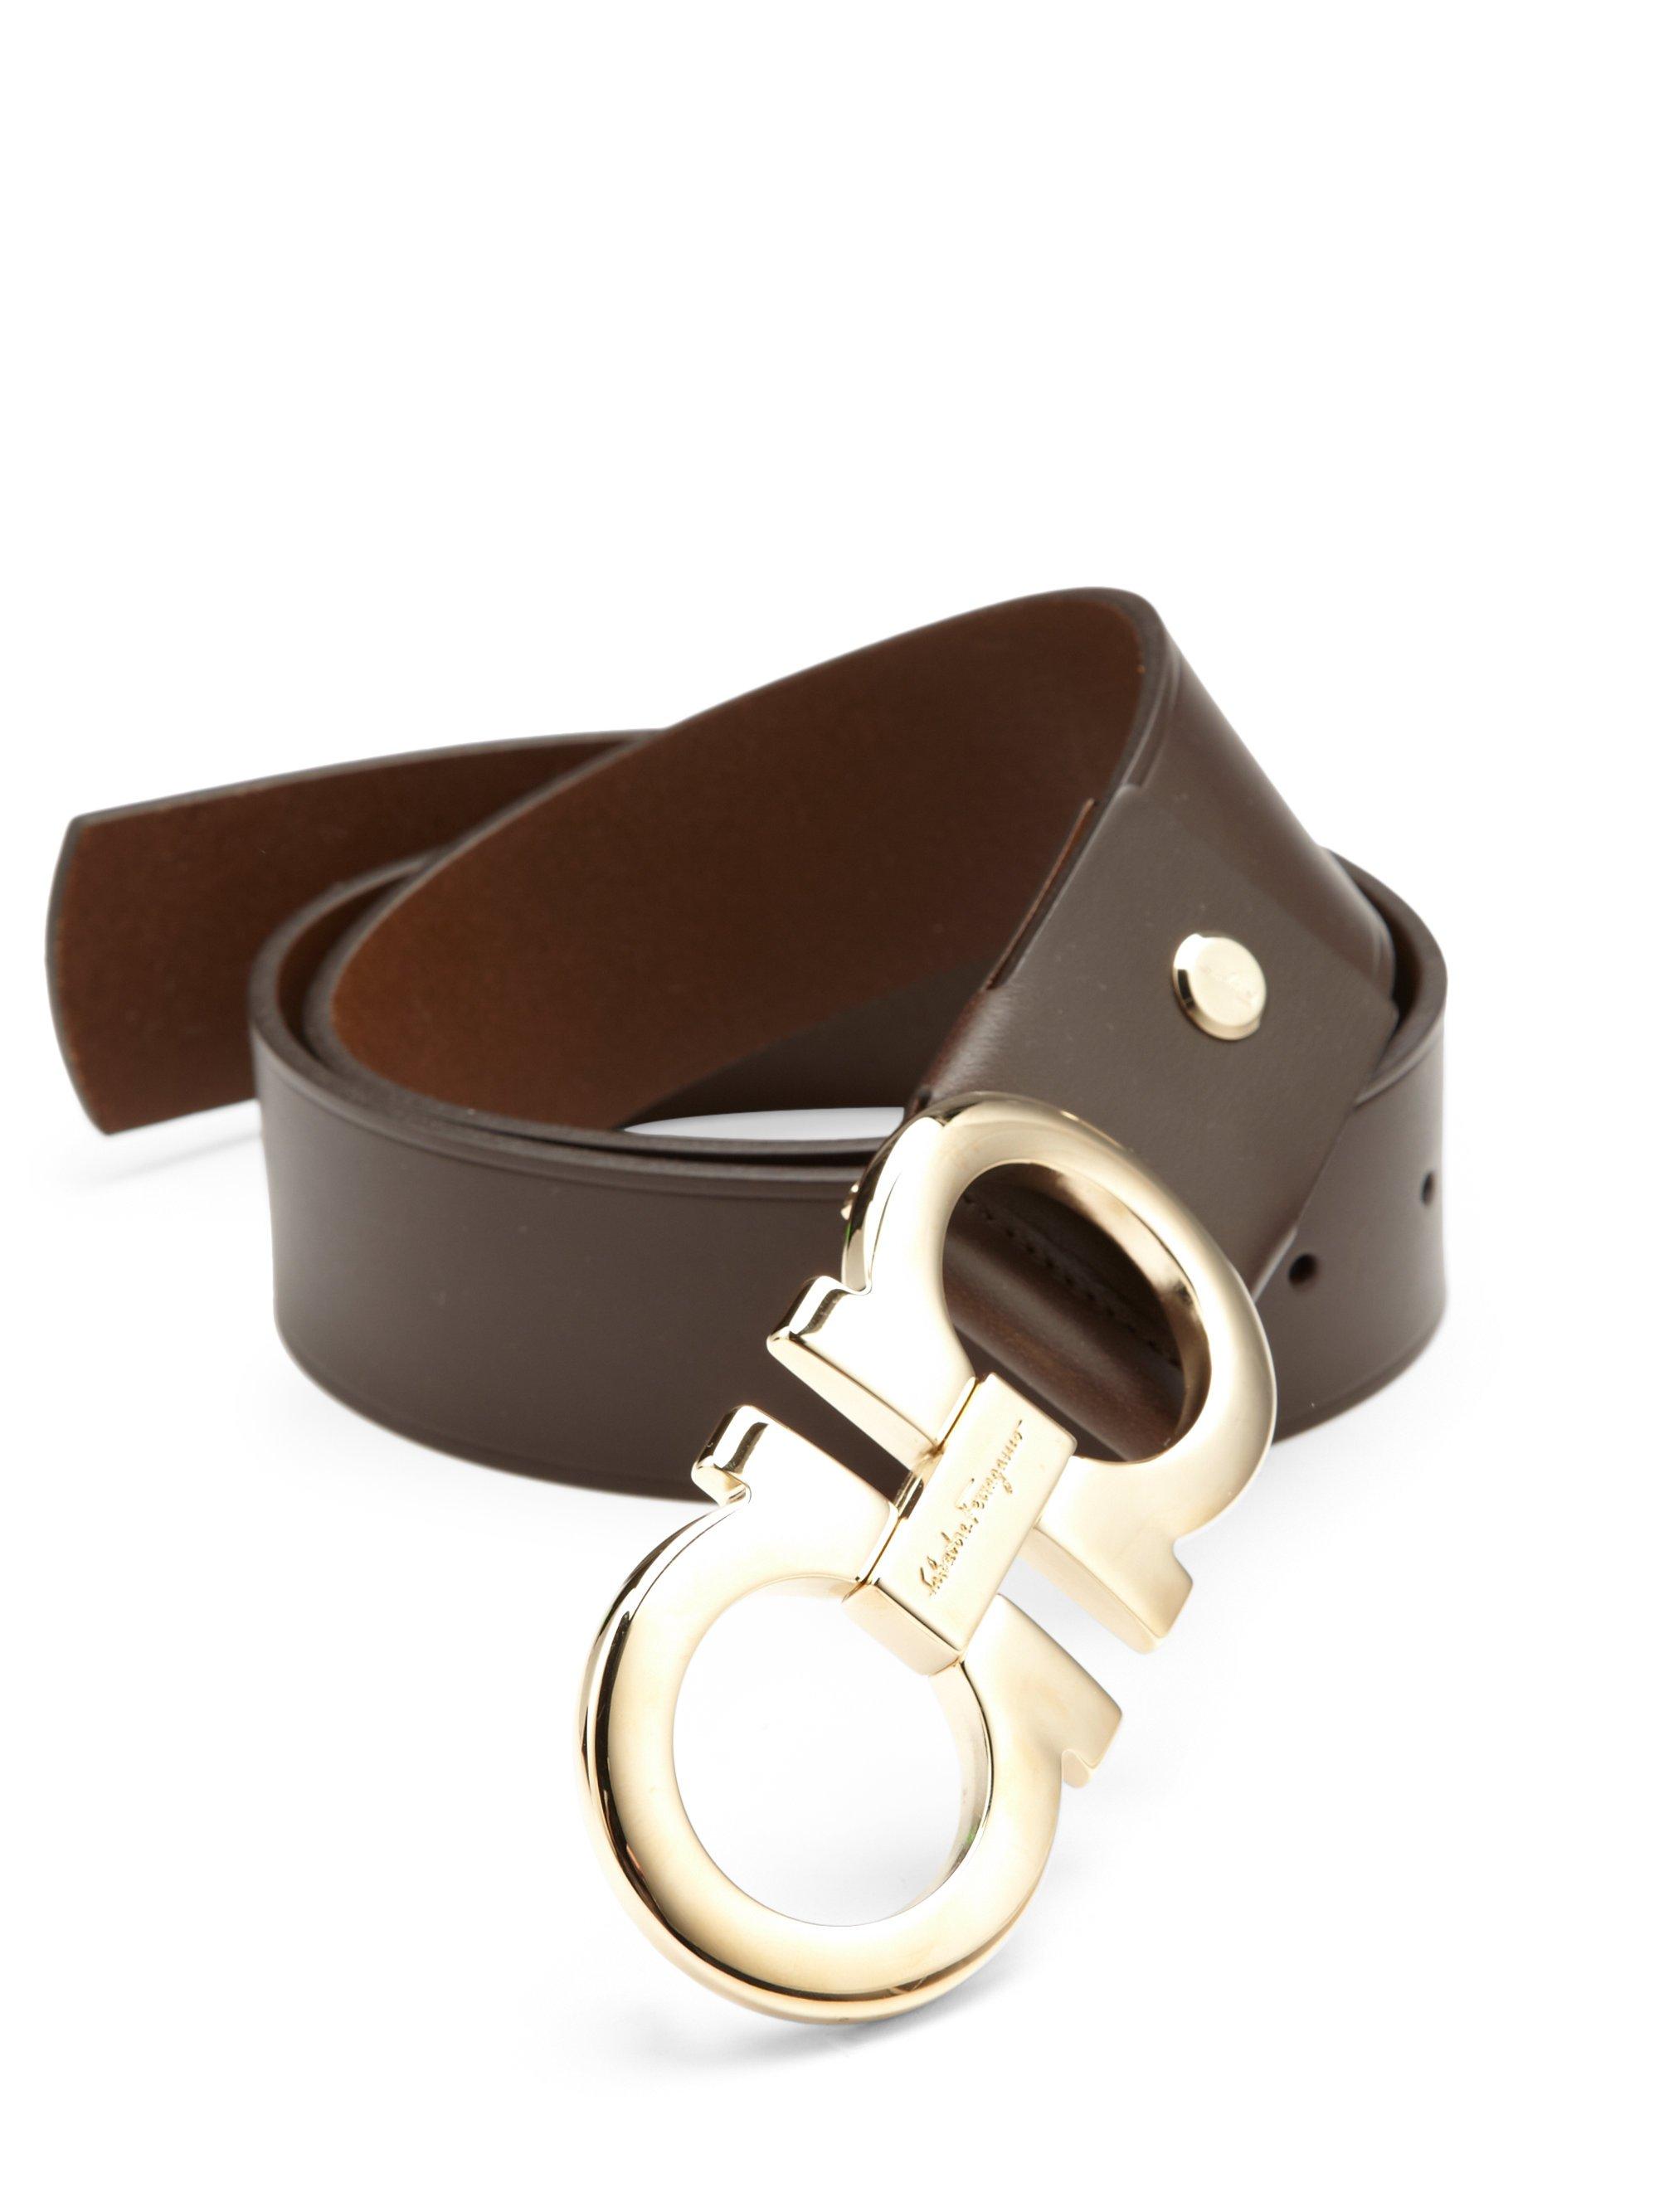 ferragamo gancini adjustable leather belt in brown